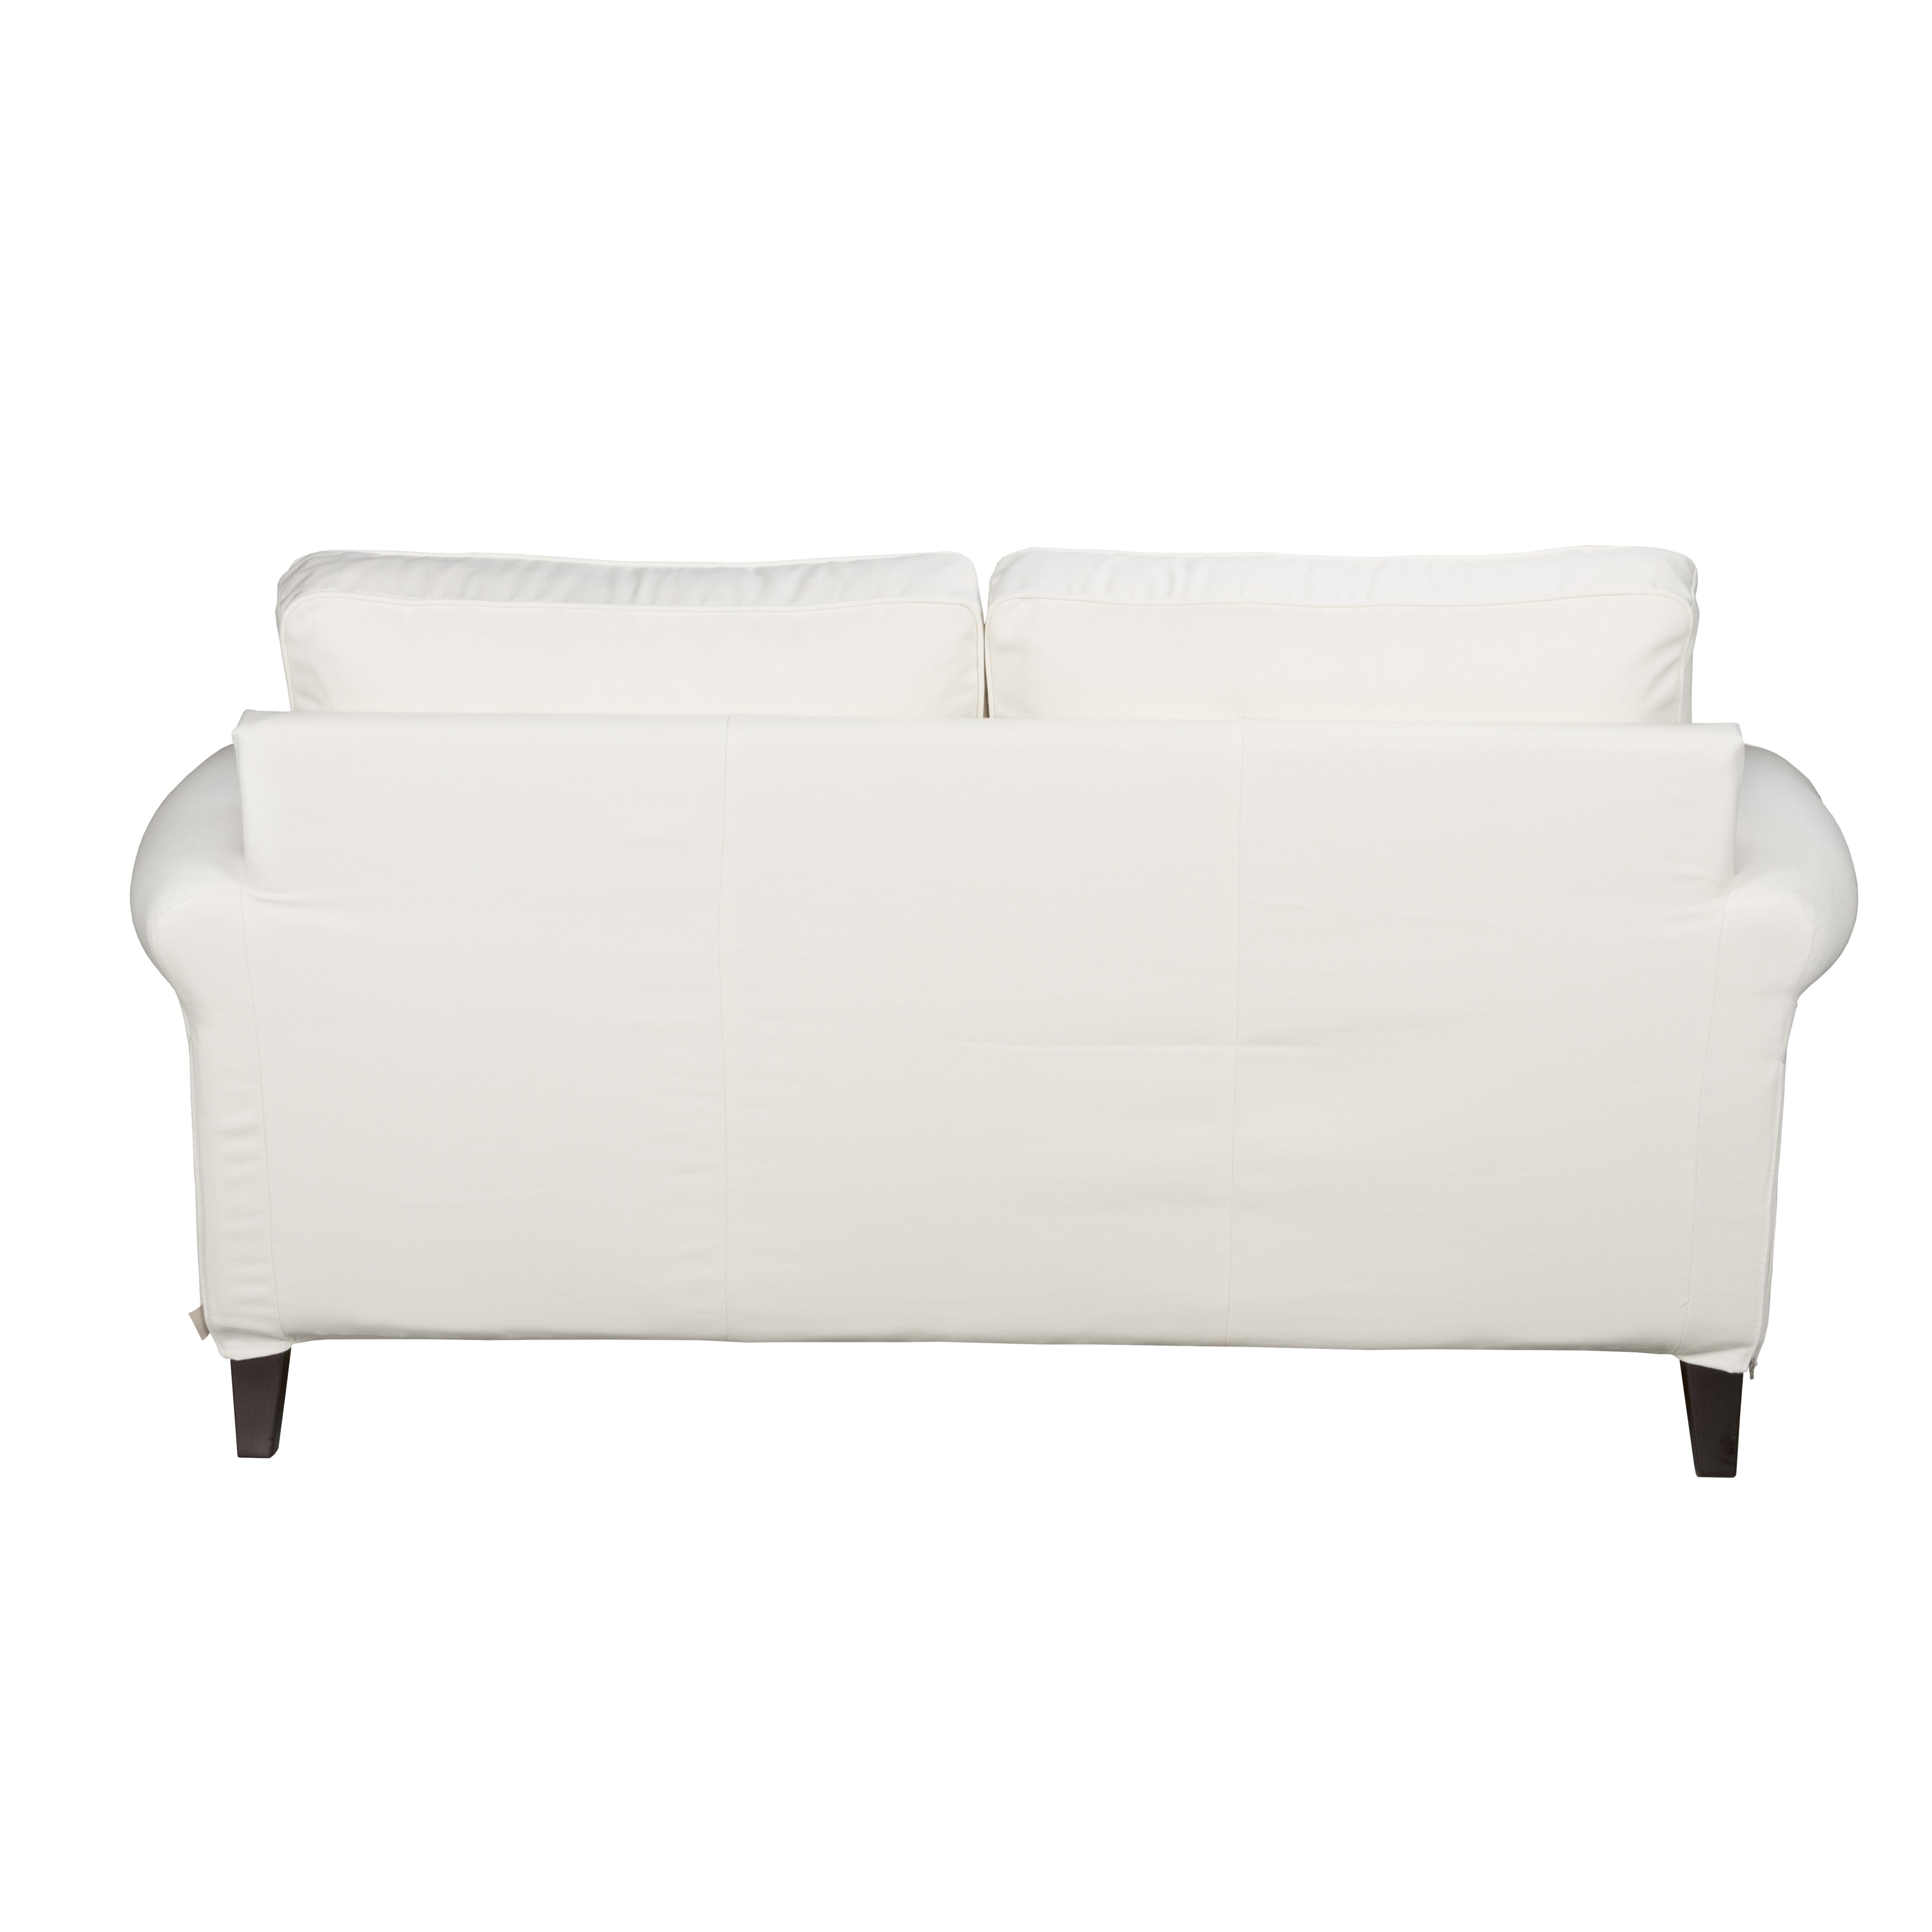 Djursholm soffa 2-sits bakifrån - englesson.se